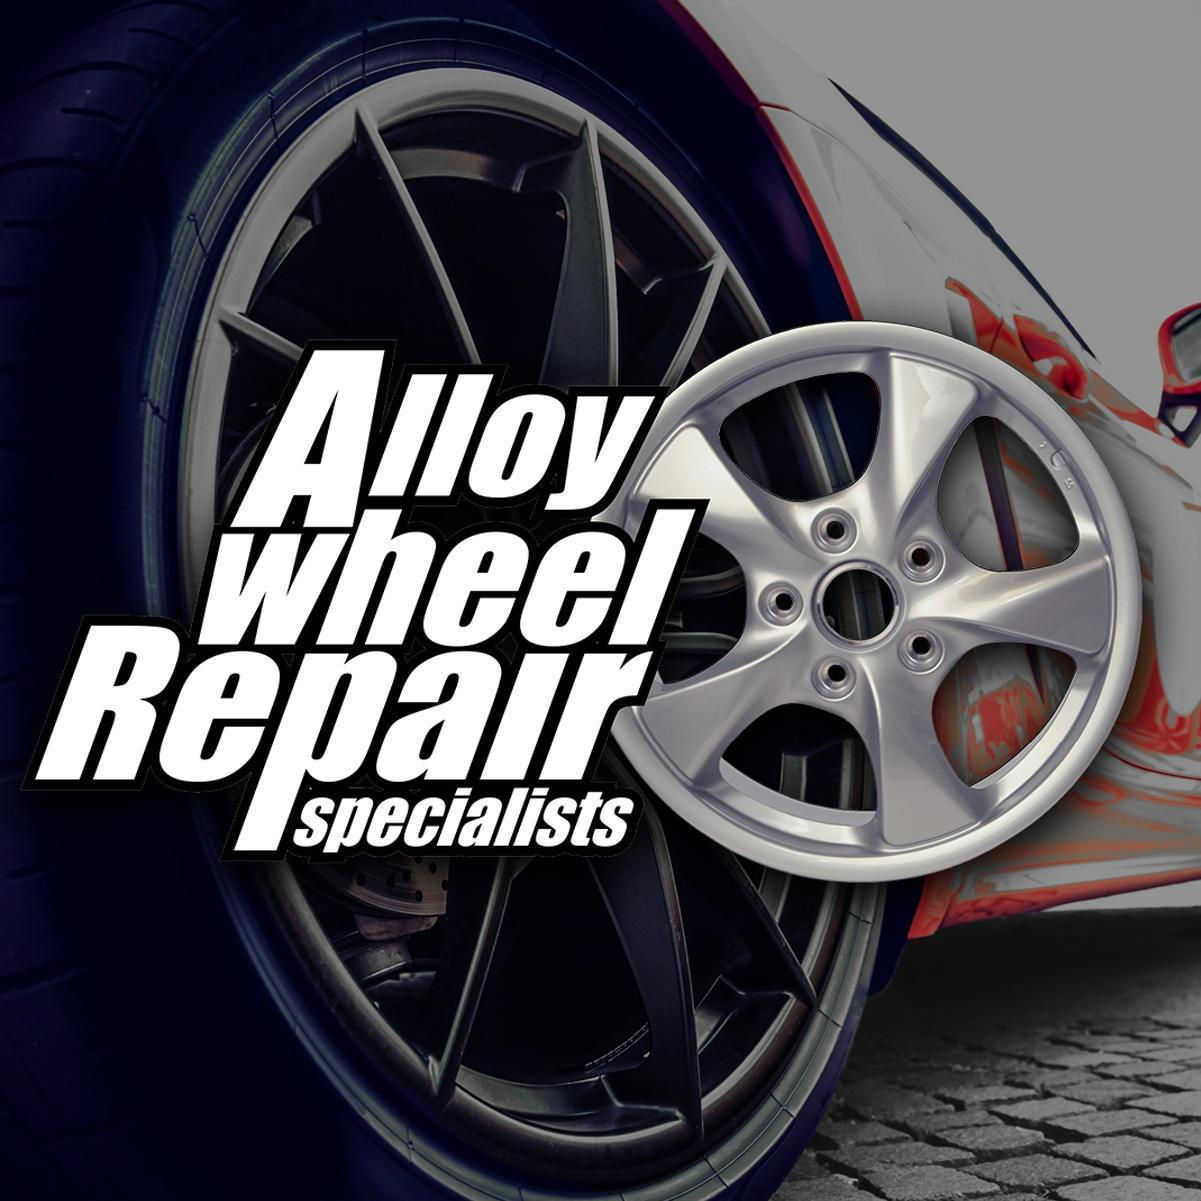 Alloy Wheel Repair Specialists of Wisconsin